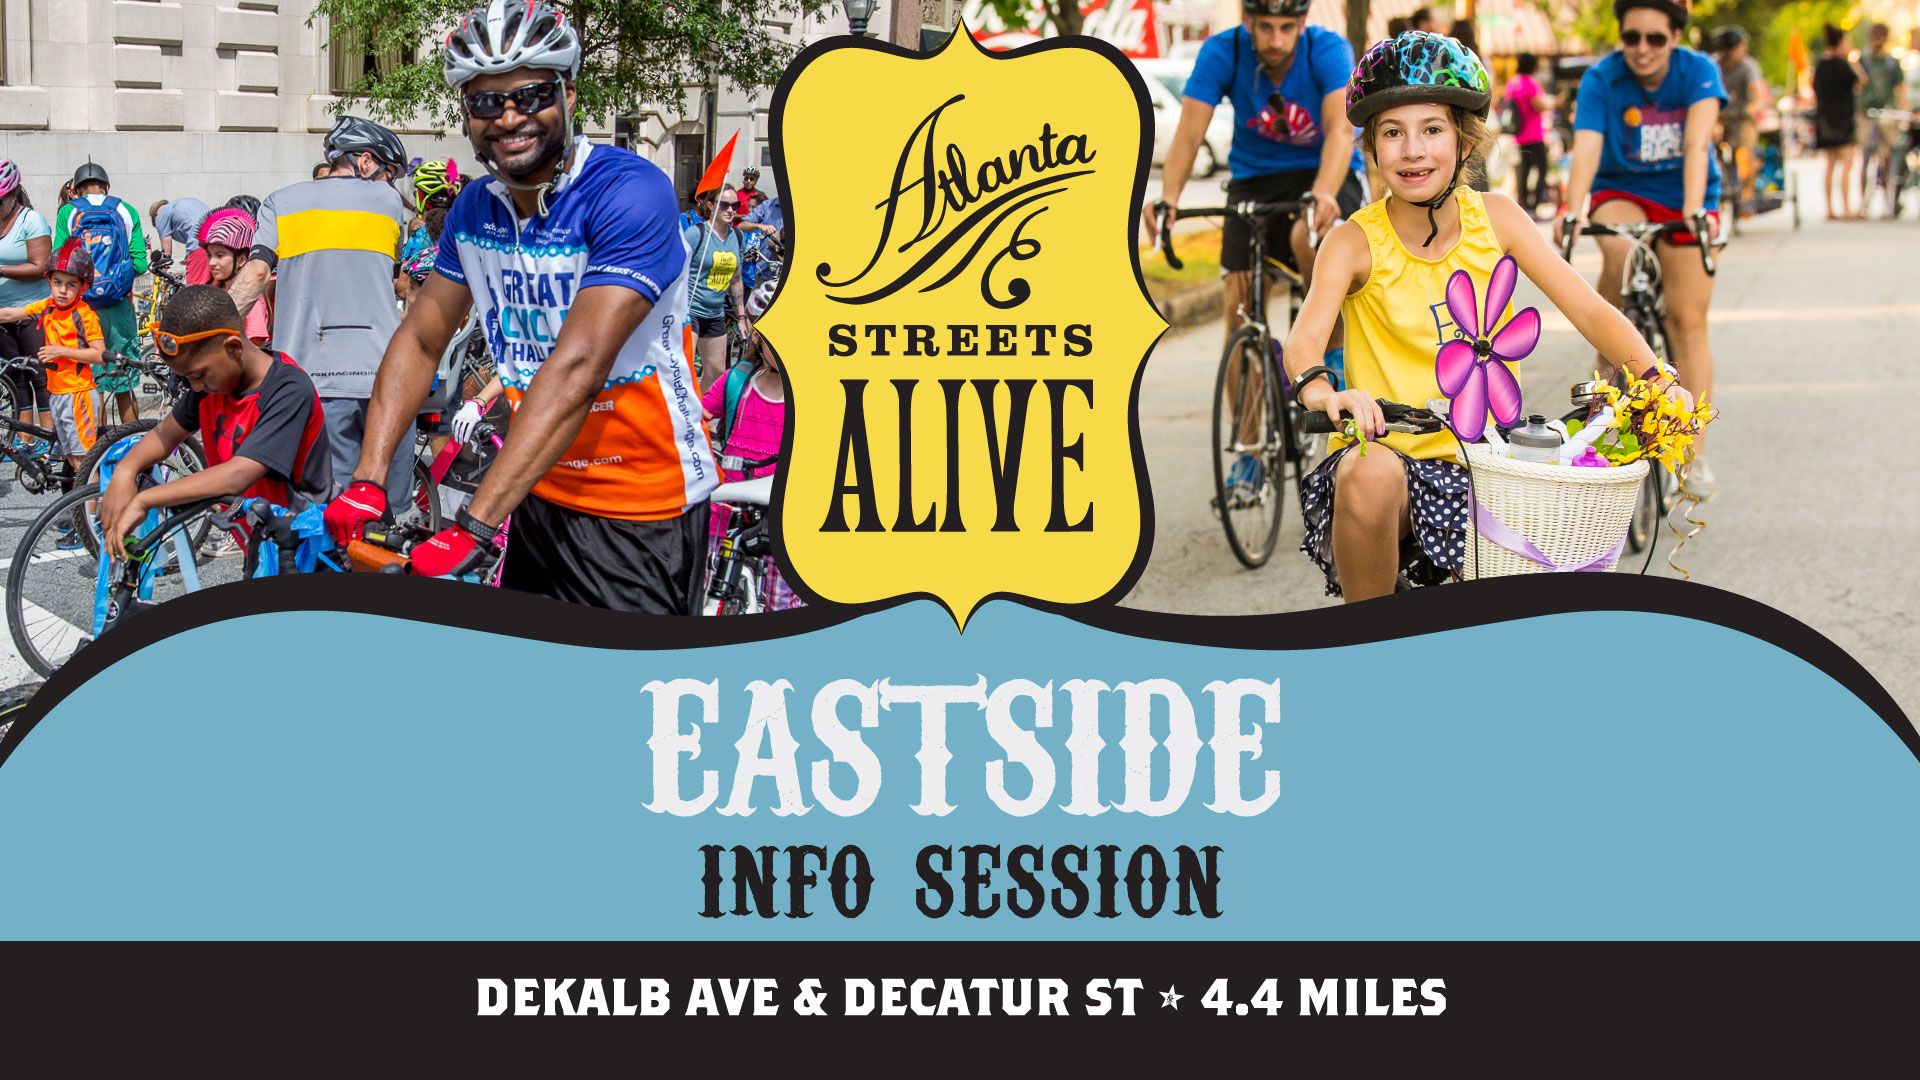 Info Session: Atlanta Streets Alive - Eastside